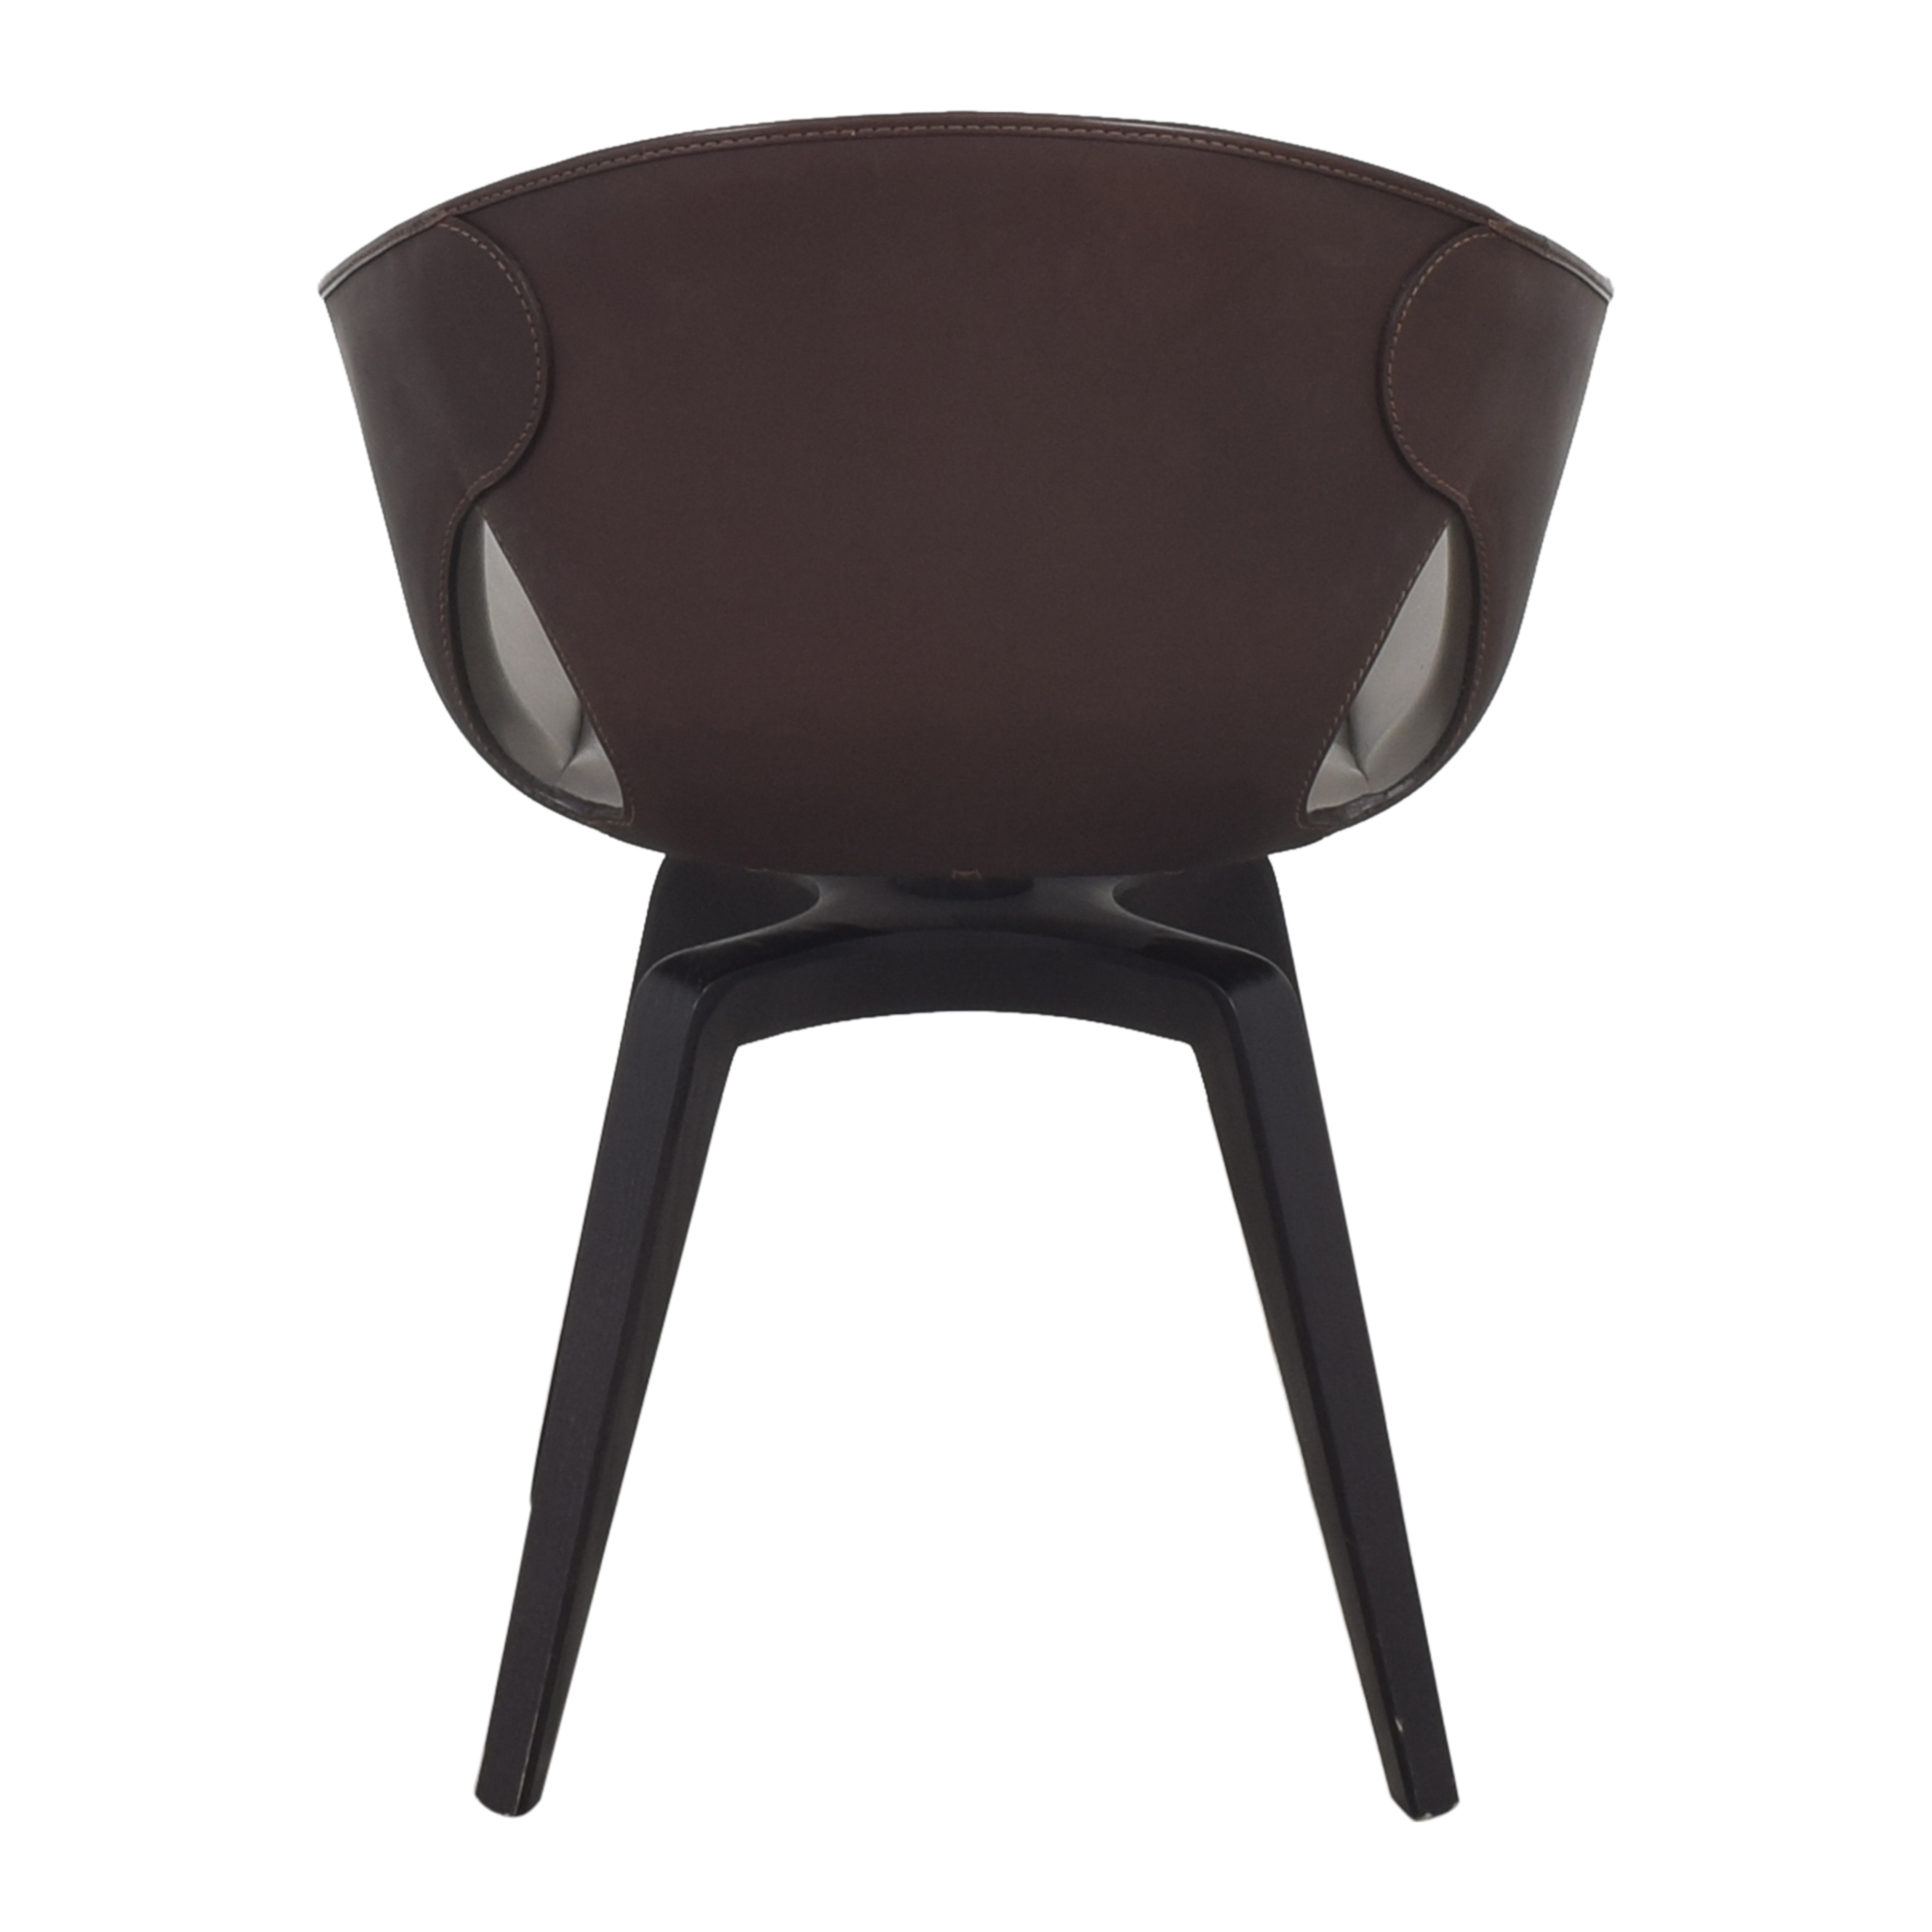 shop Poltrona Frau Ginger Side Chair Poltrona Frau Chairs